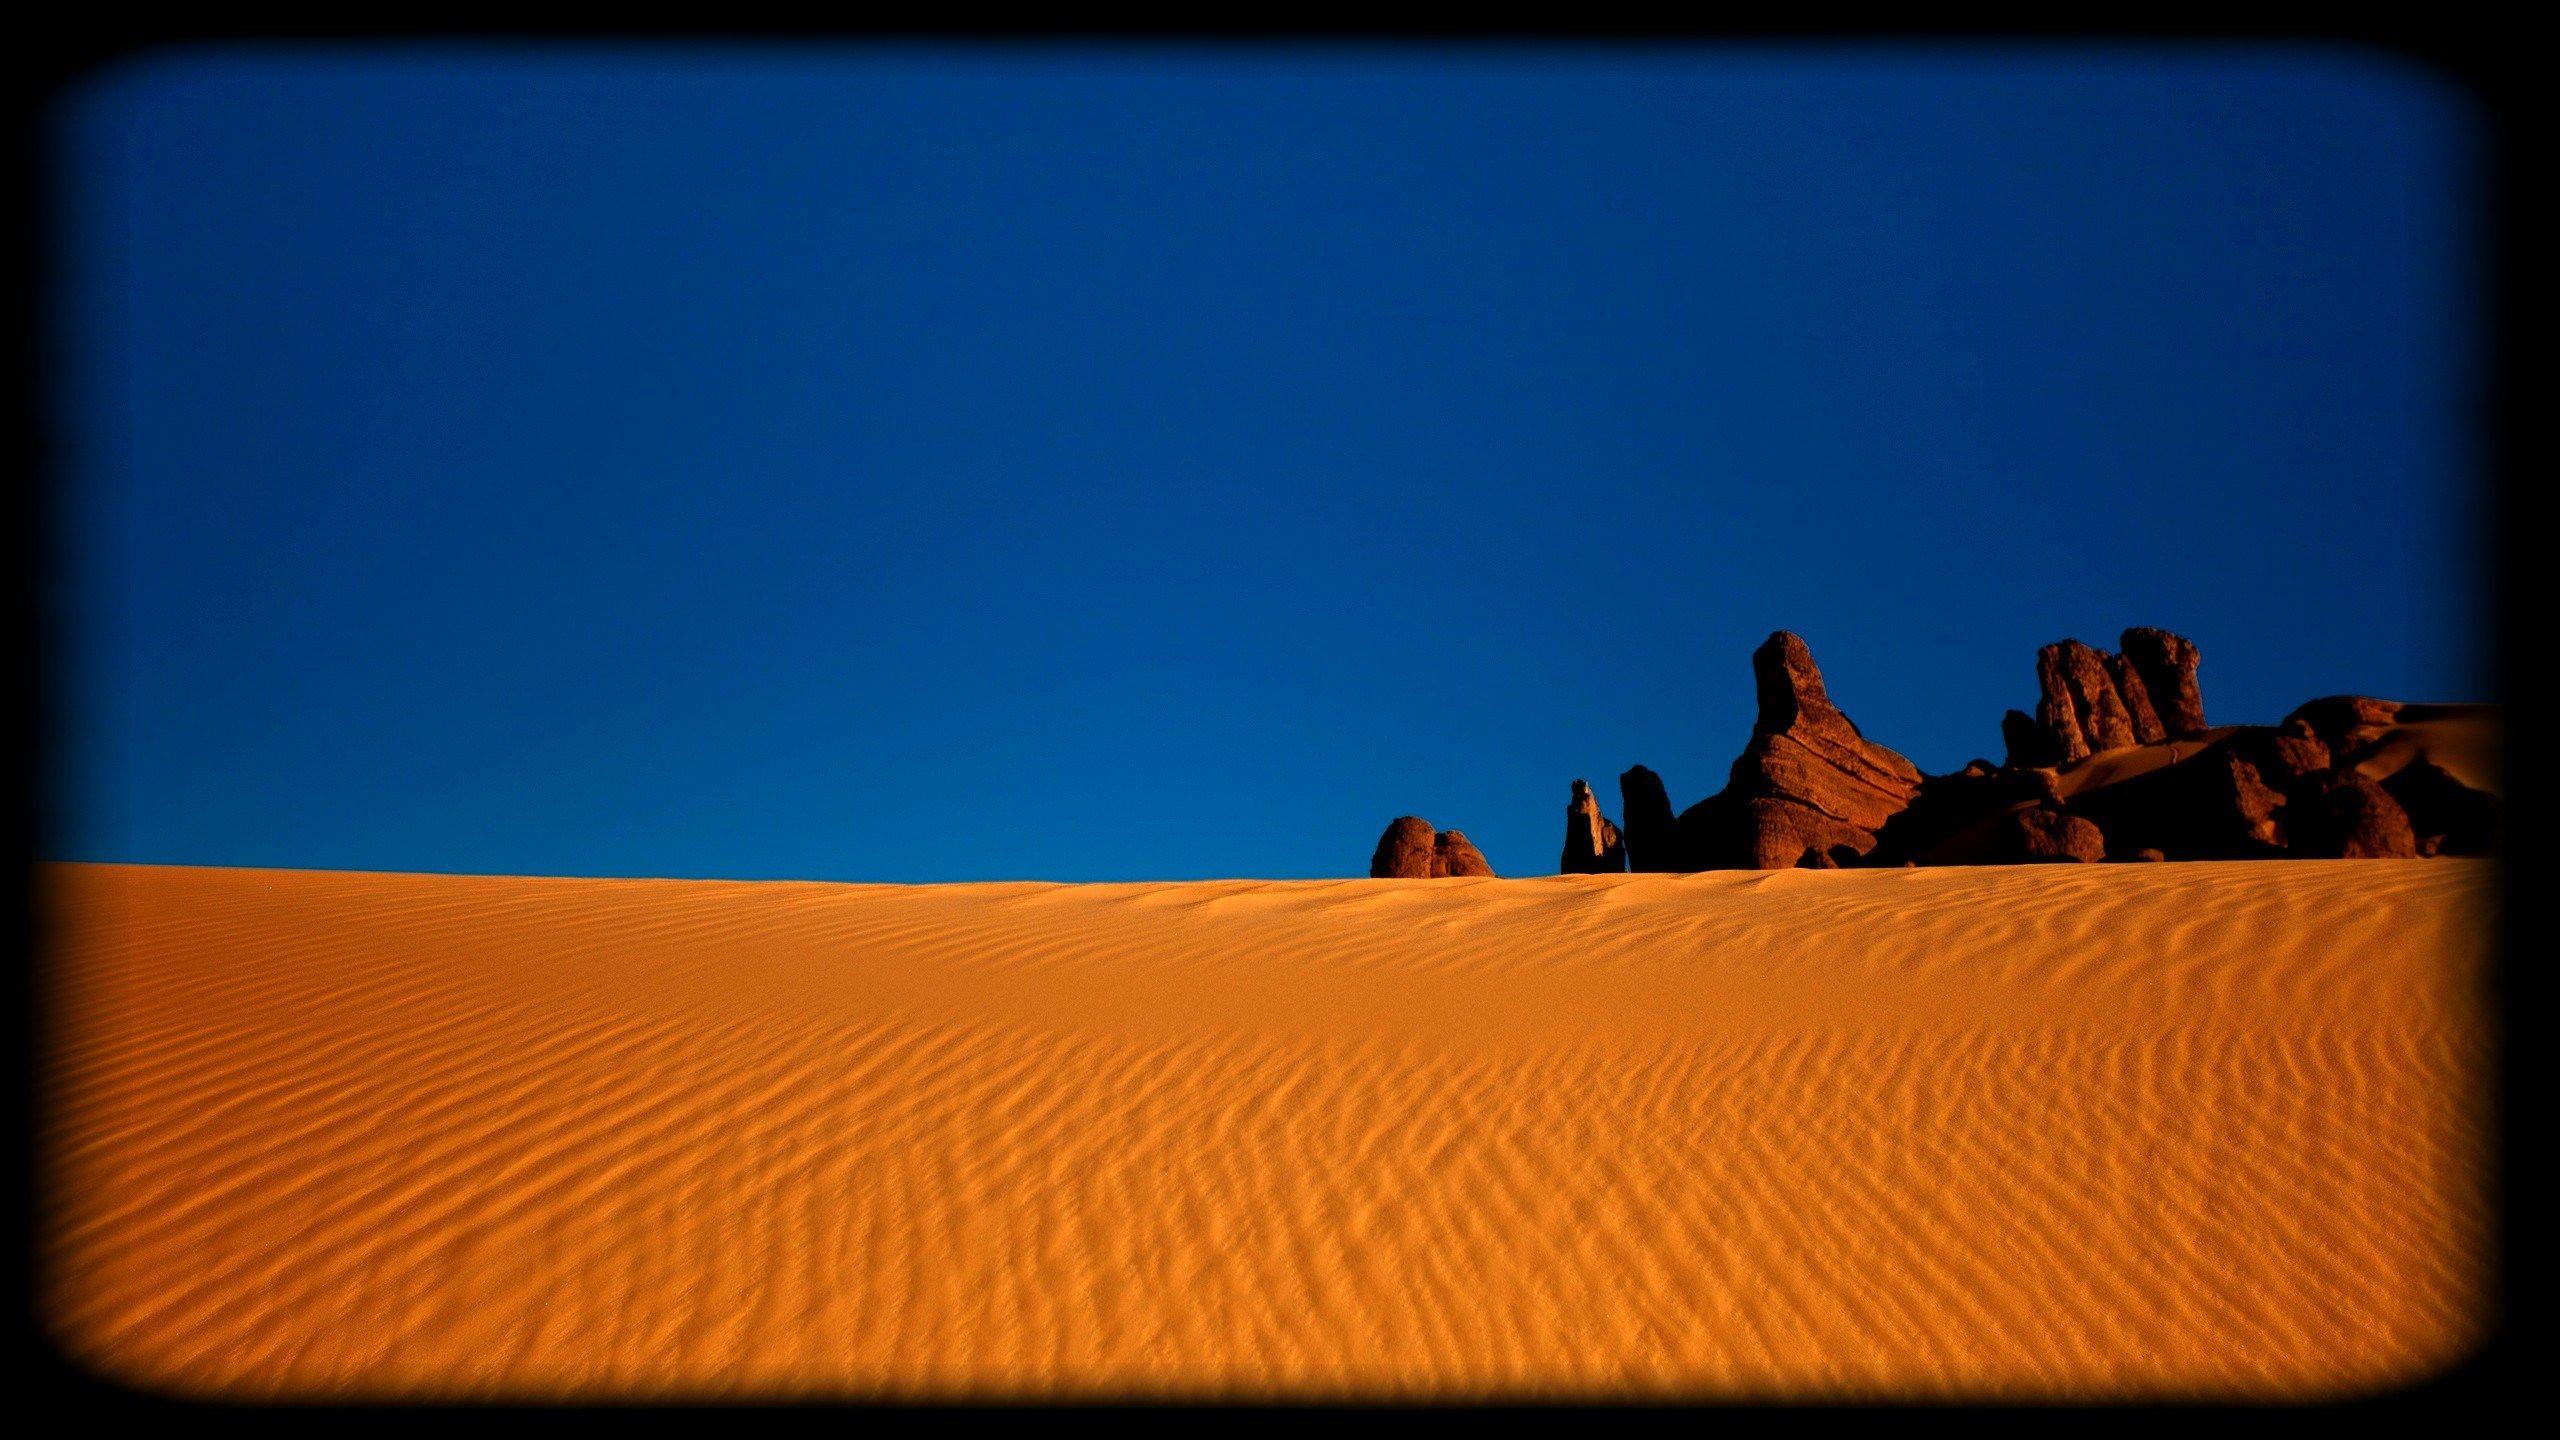 2560x1440 Free Desktop Pictures Desert Largest Desert Nature Wallpaper Desktop Wallpapers Backgrounds